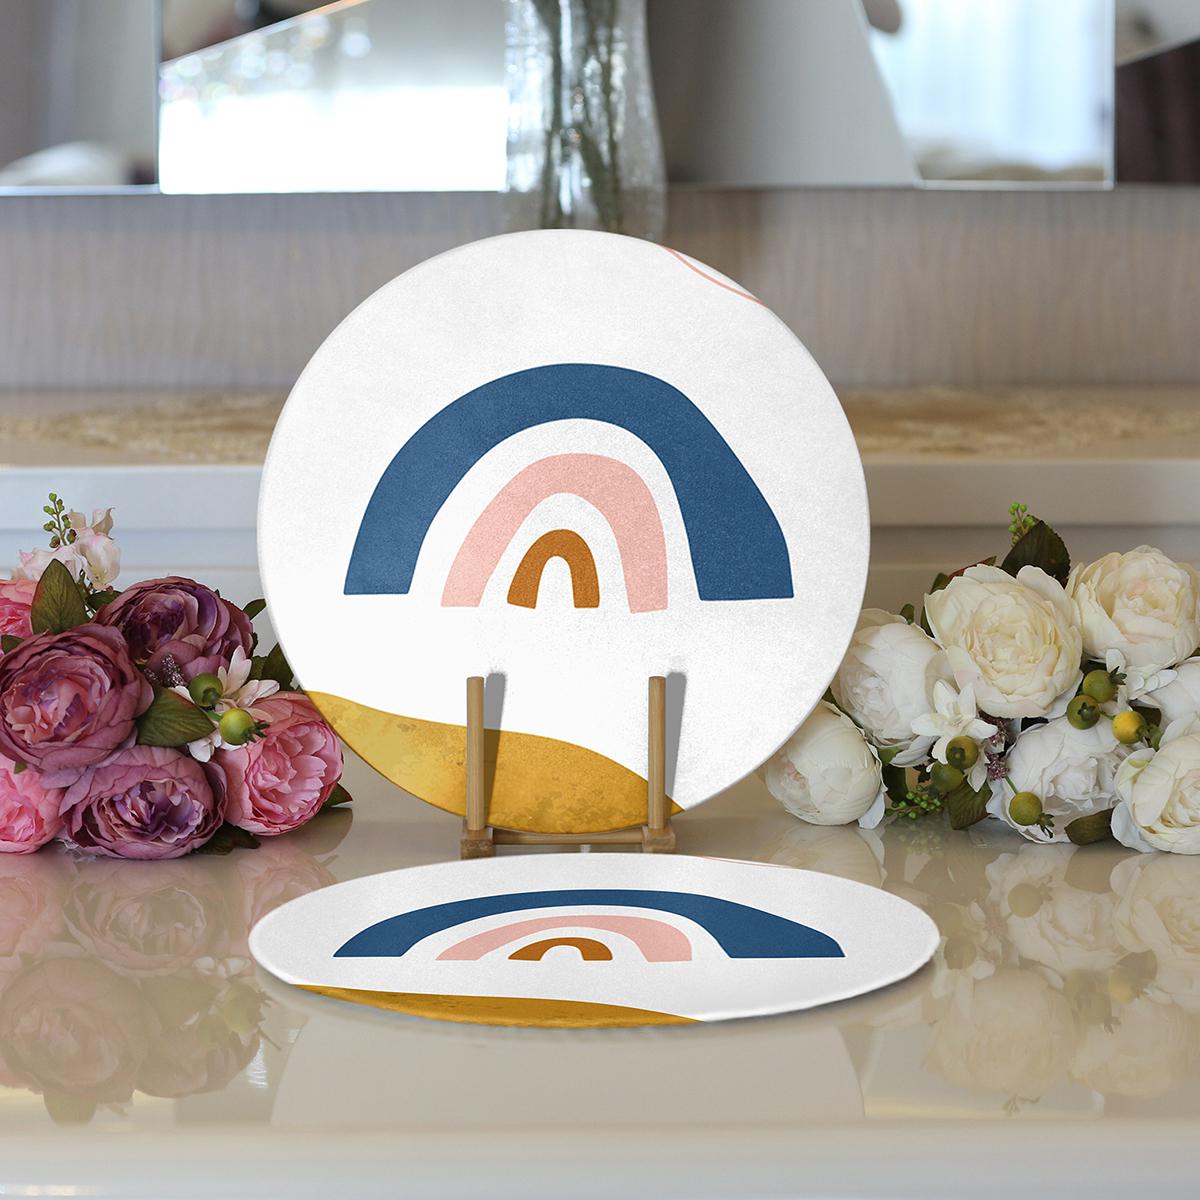 Realhomes Pastel Renkli Zeminli Onedraw Çizimli Dijital Baskılı Modern 2'li Yuvarlak Servis Altlığı - Supla Realhomes